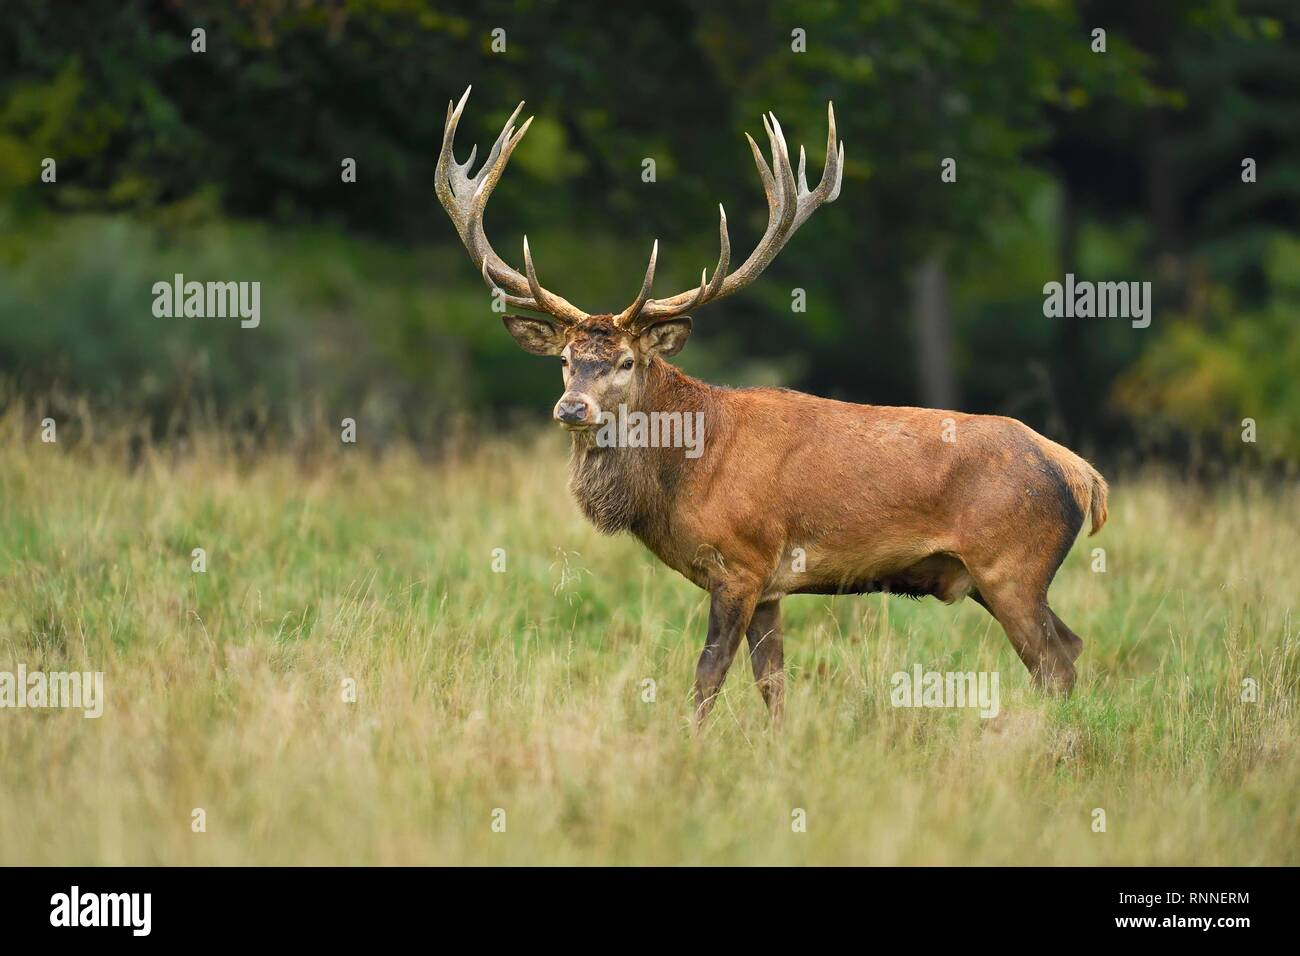 Capitalist red deer (Cervus elaphus), stands at the edge of the forest, Jägersborg, Denmark - Stock Image